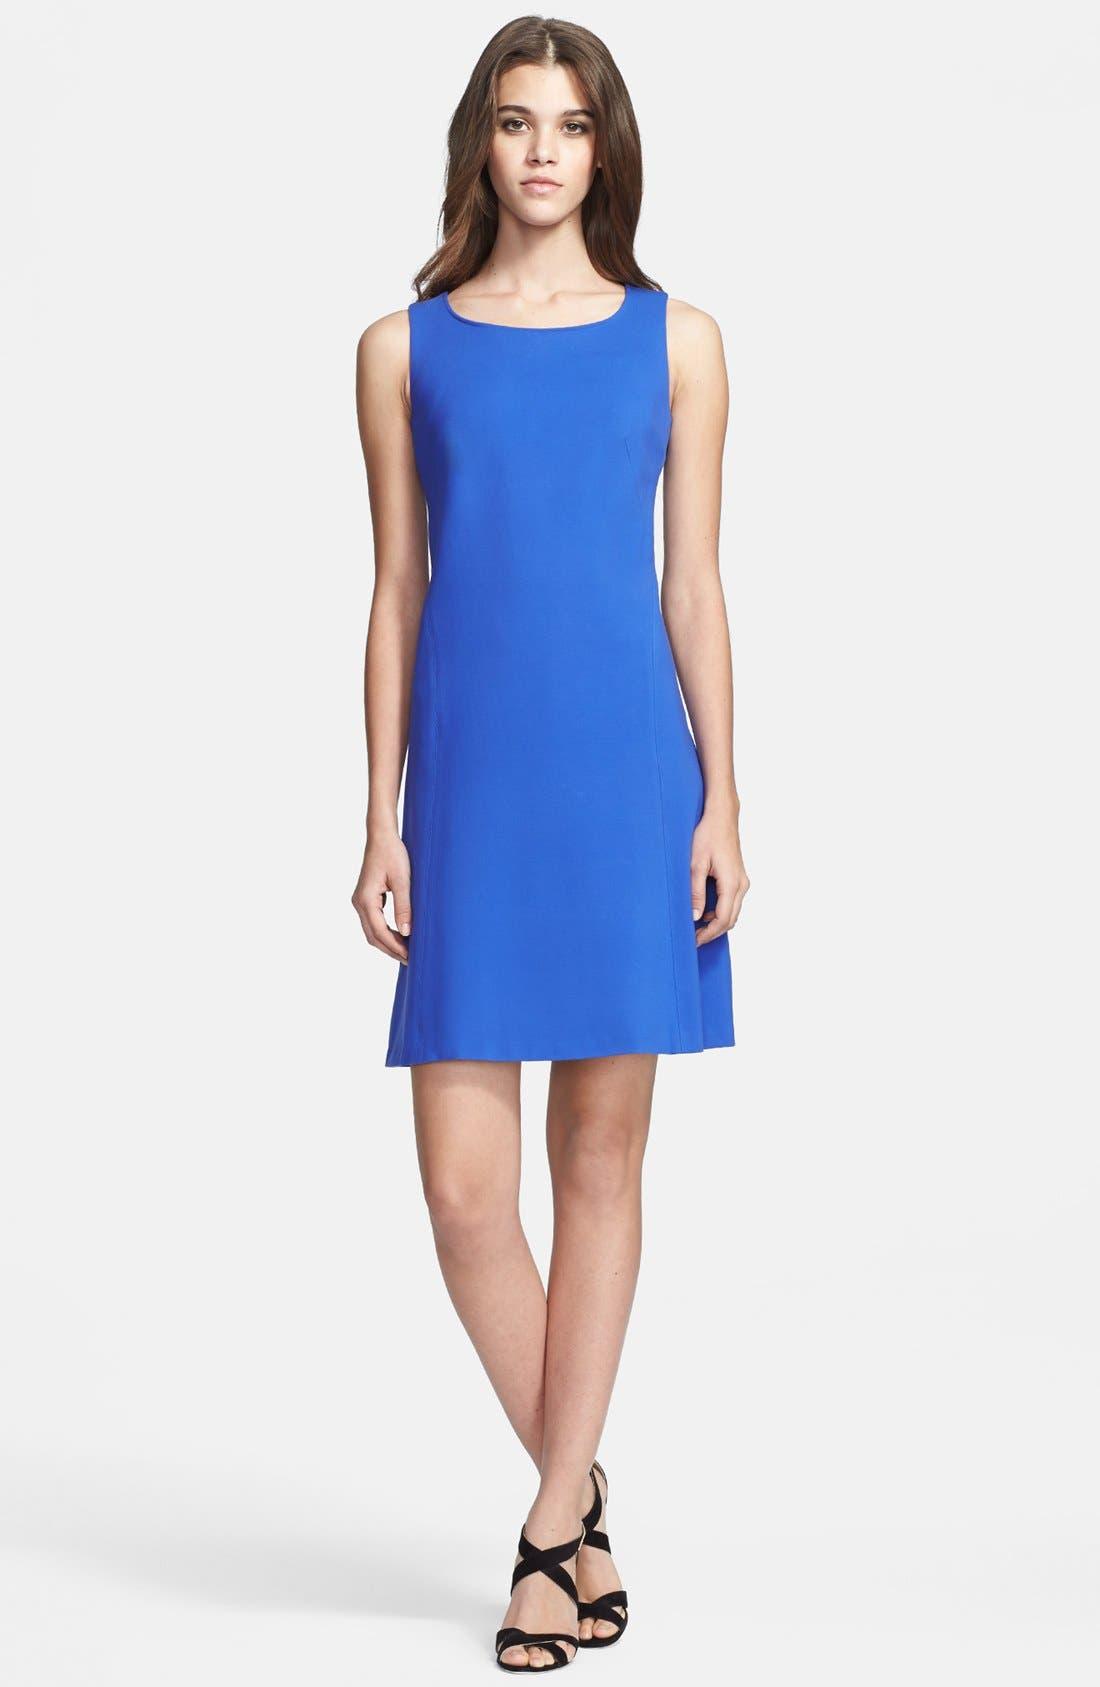 Alternate Image 1 Selected - Armani Collezioni Sleeveless Double Face Jersey Dress